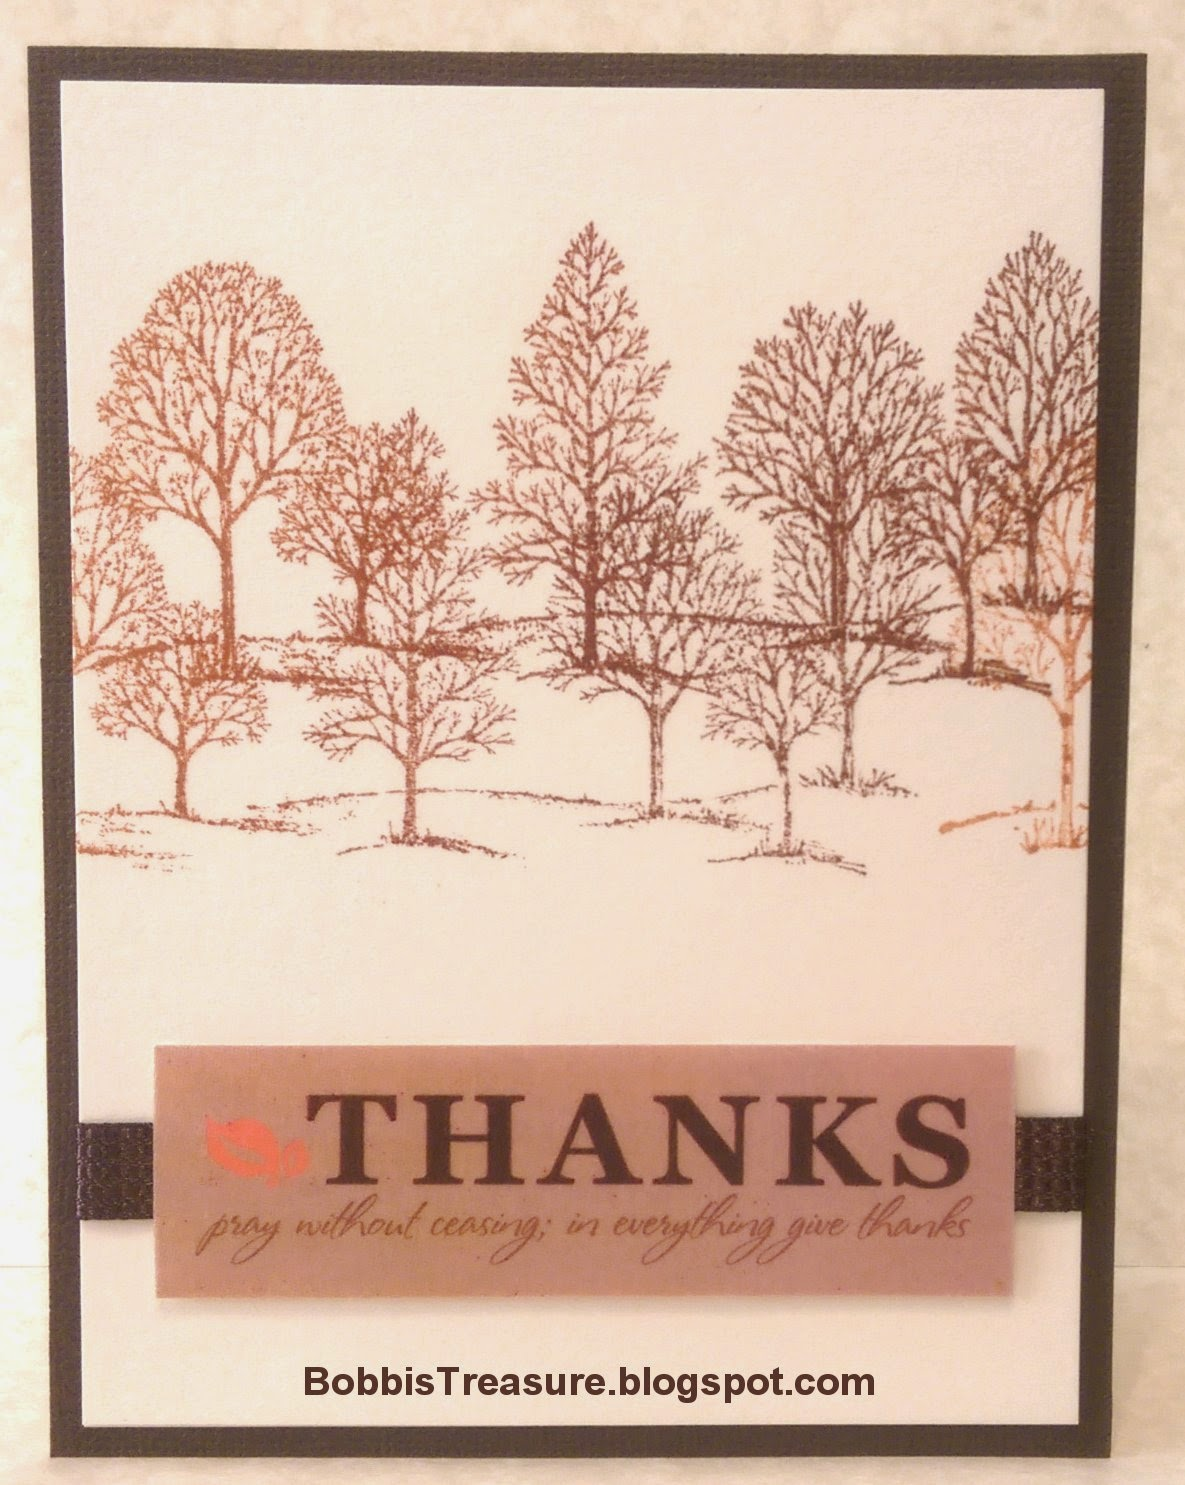 http://bobbistreasure.blogspot.com/2014/10/w2sb-november-challenge-gratitude.html